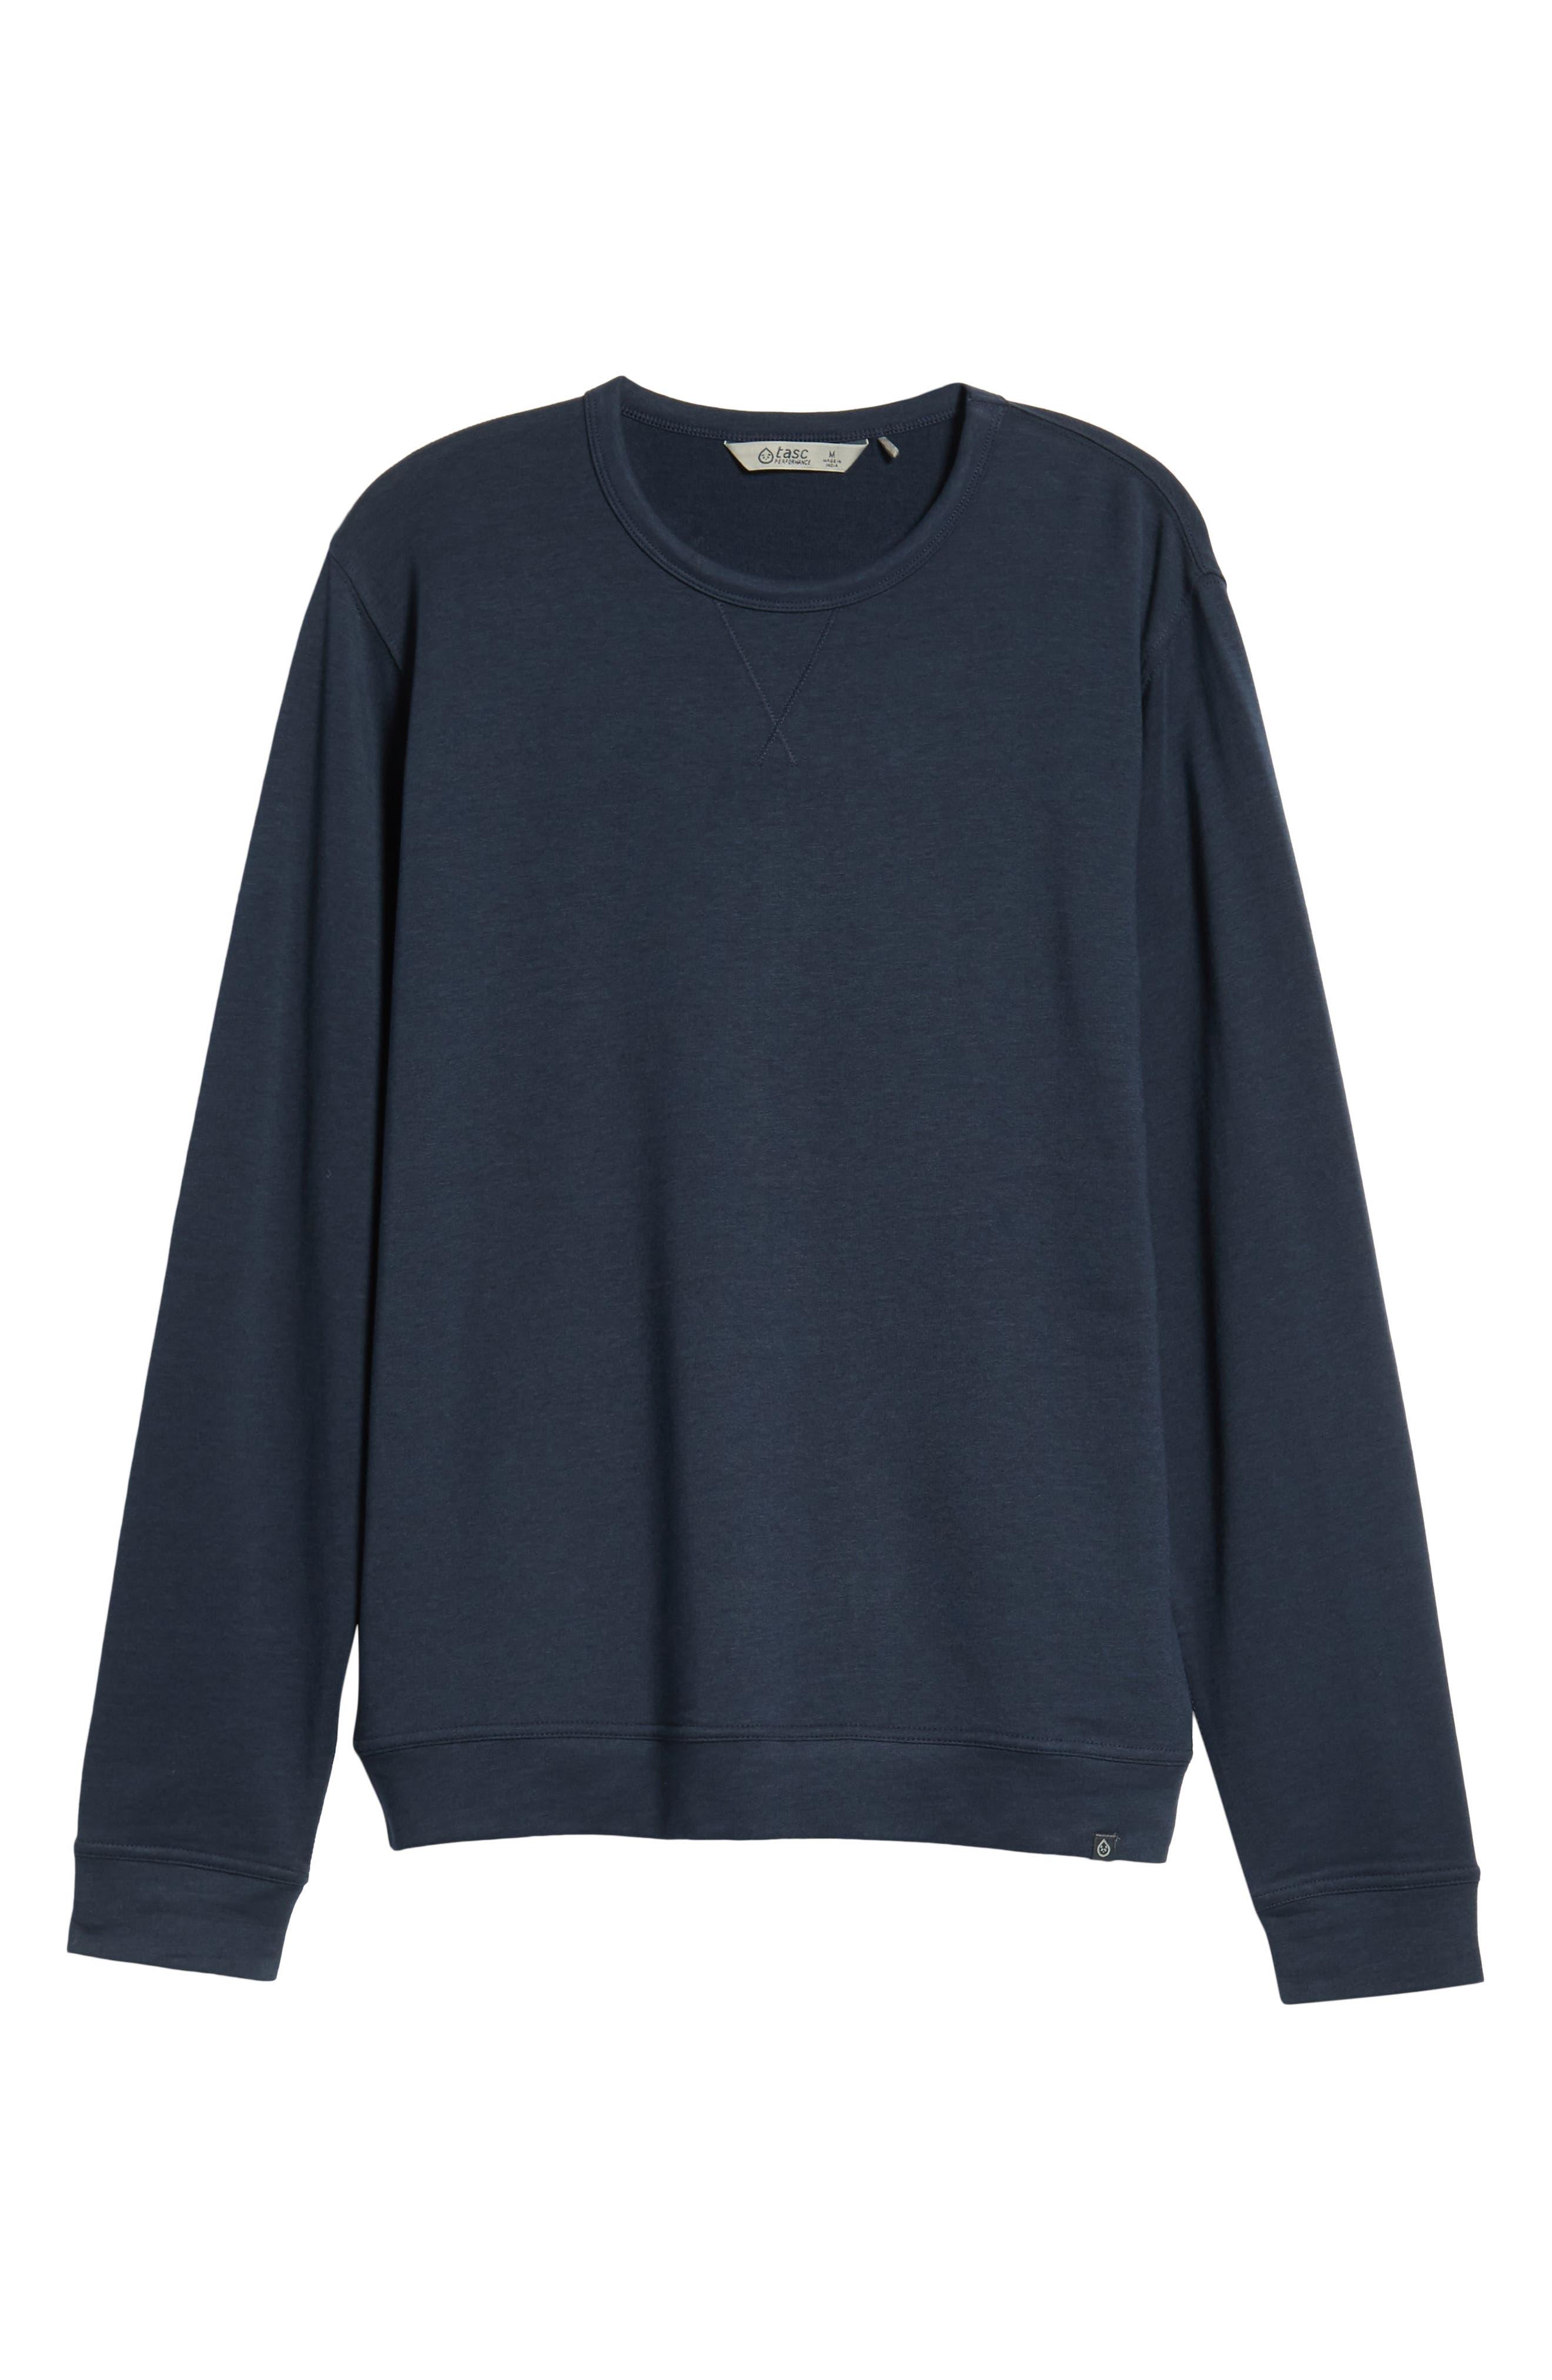 TASC PERFORMANCE, Legacy Crewneck Semi Fitted Sweatshirt, Alternate thumbnail 6, color, CLASSIC NAVY